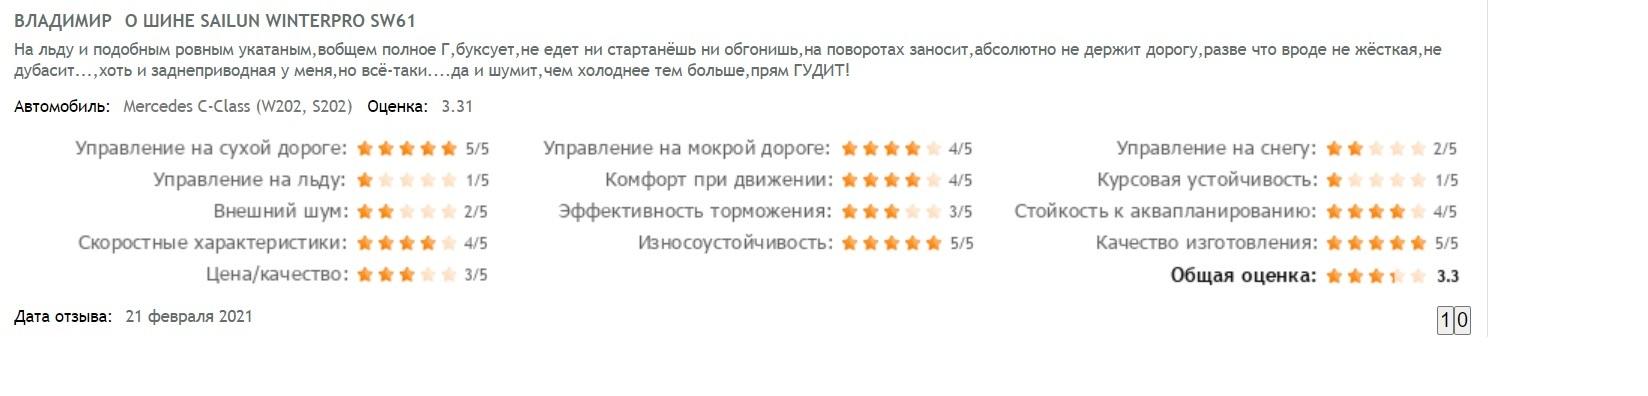 Отзыв о шинах Sailun Winterpro SW61